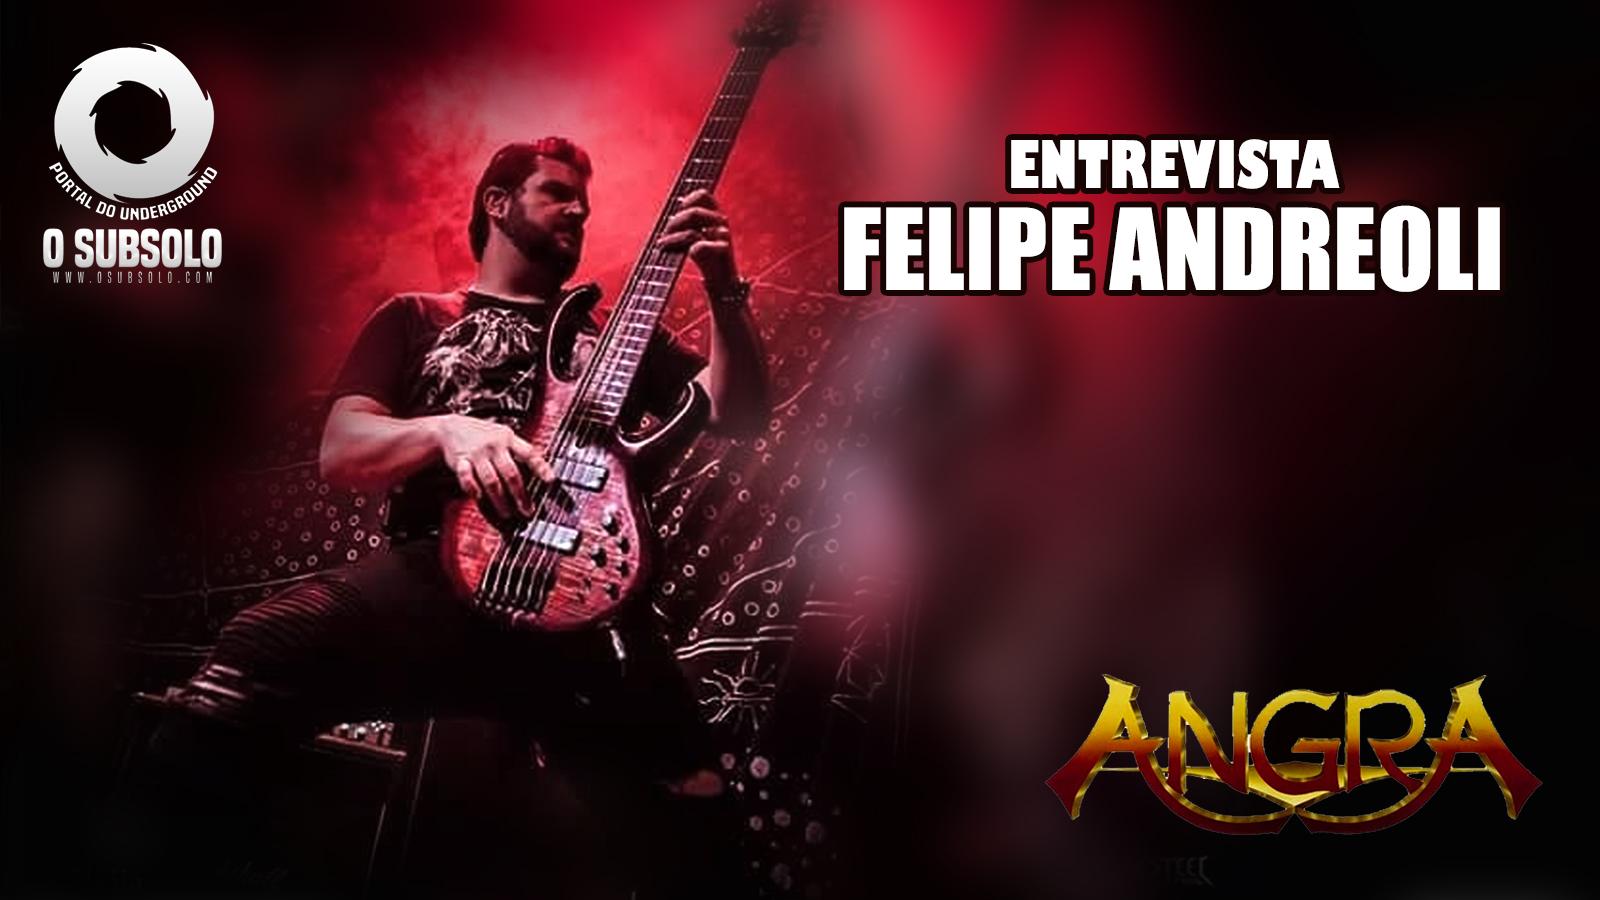 O Subsolo - Entrevista Felipe Andreoli - Angra